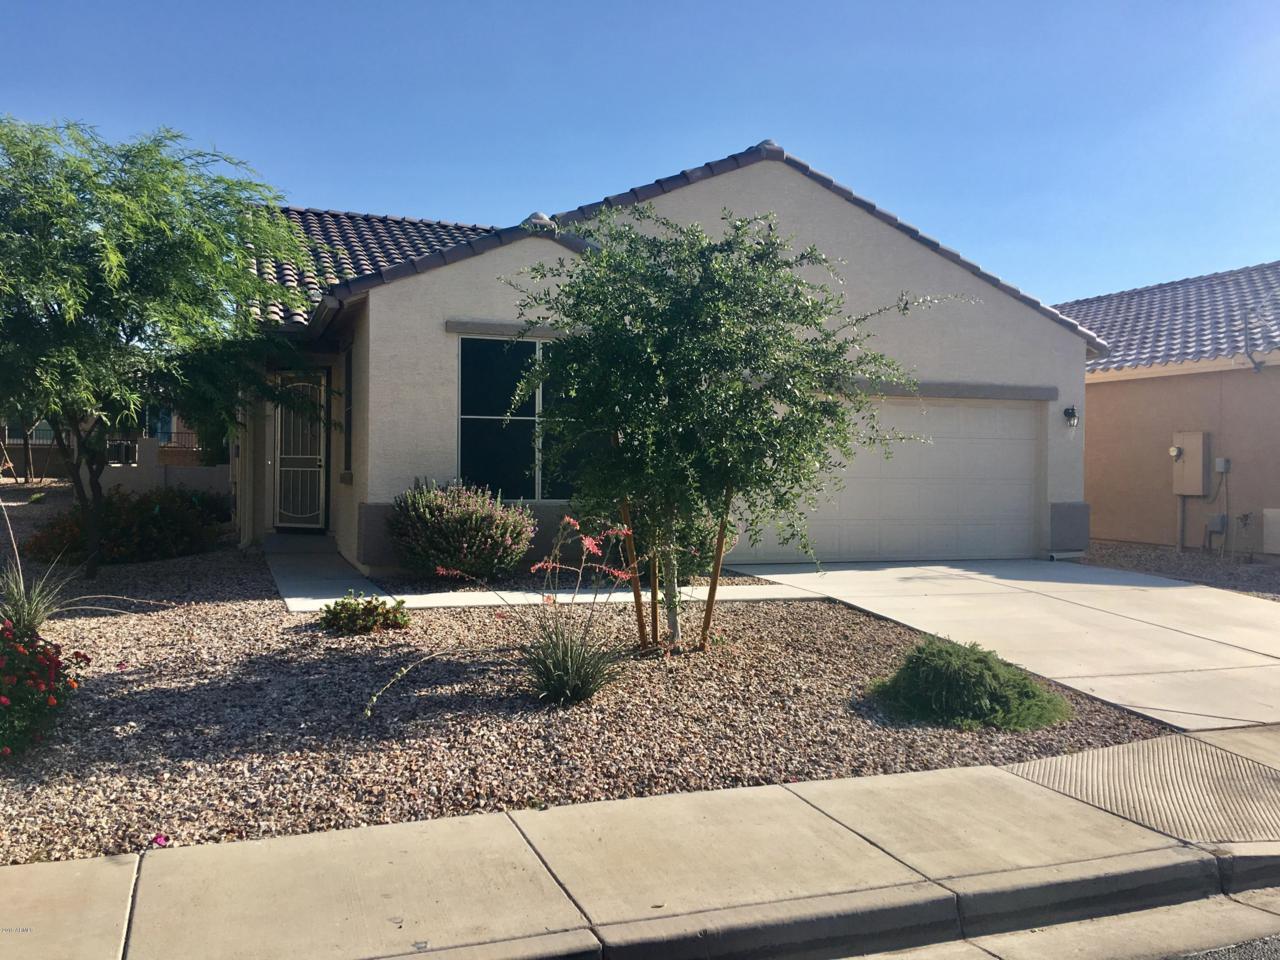 22558 W Moonlight Path, Buckeye, AZ 85326 (MLS #5935867) :: The Kibler Team